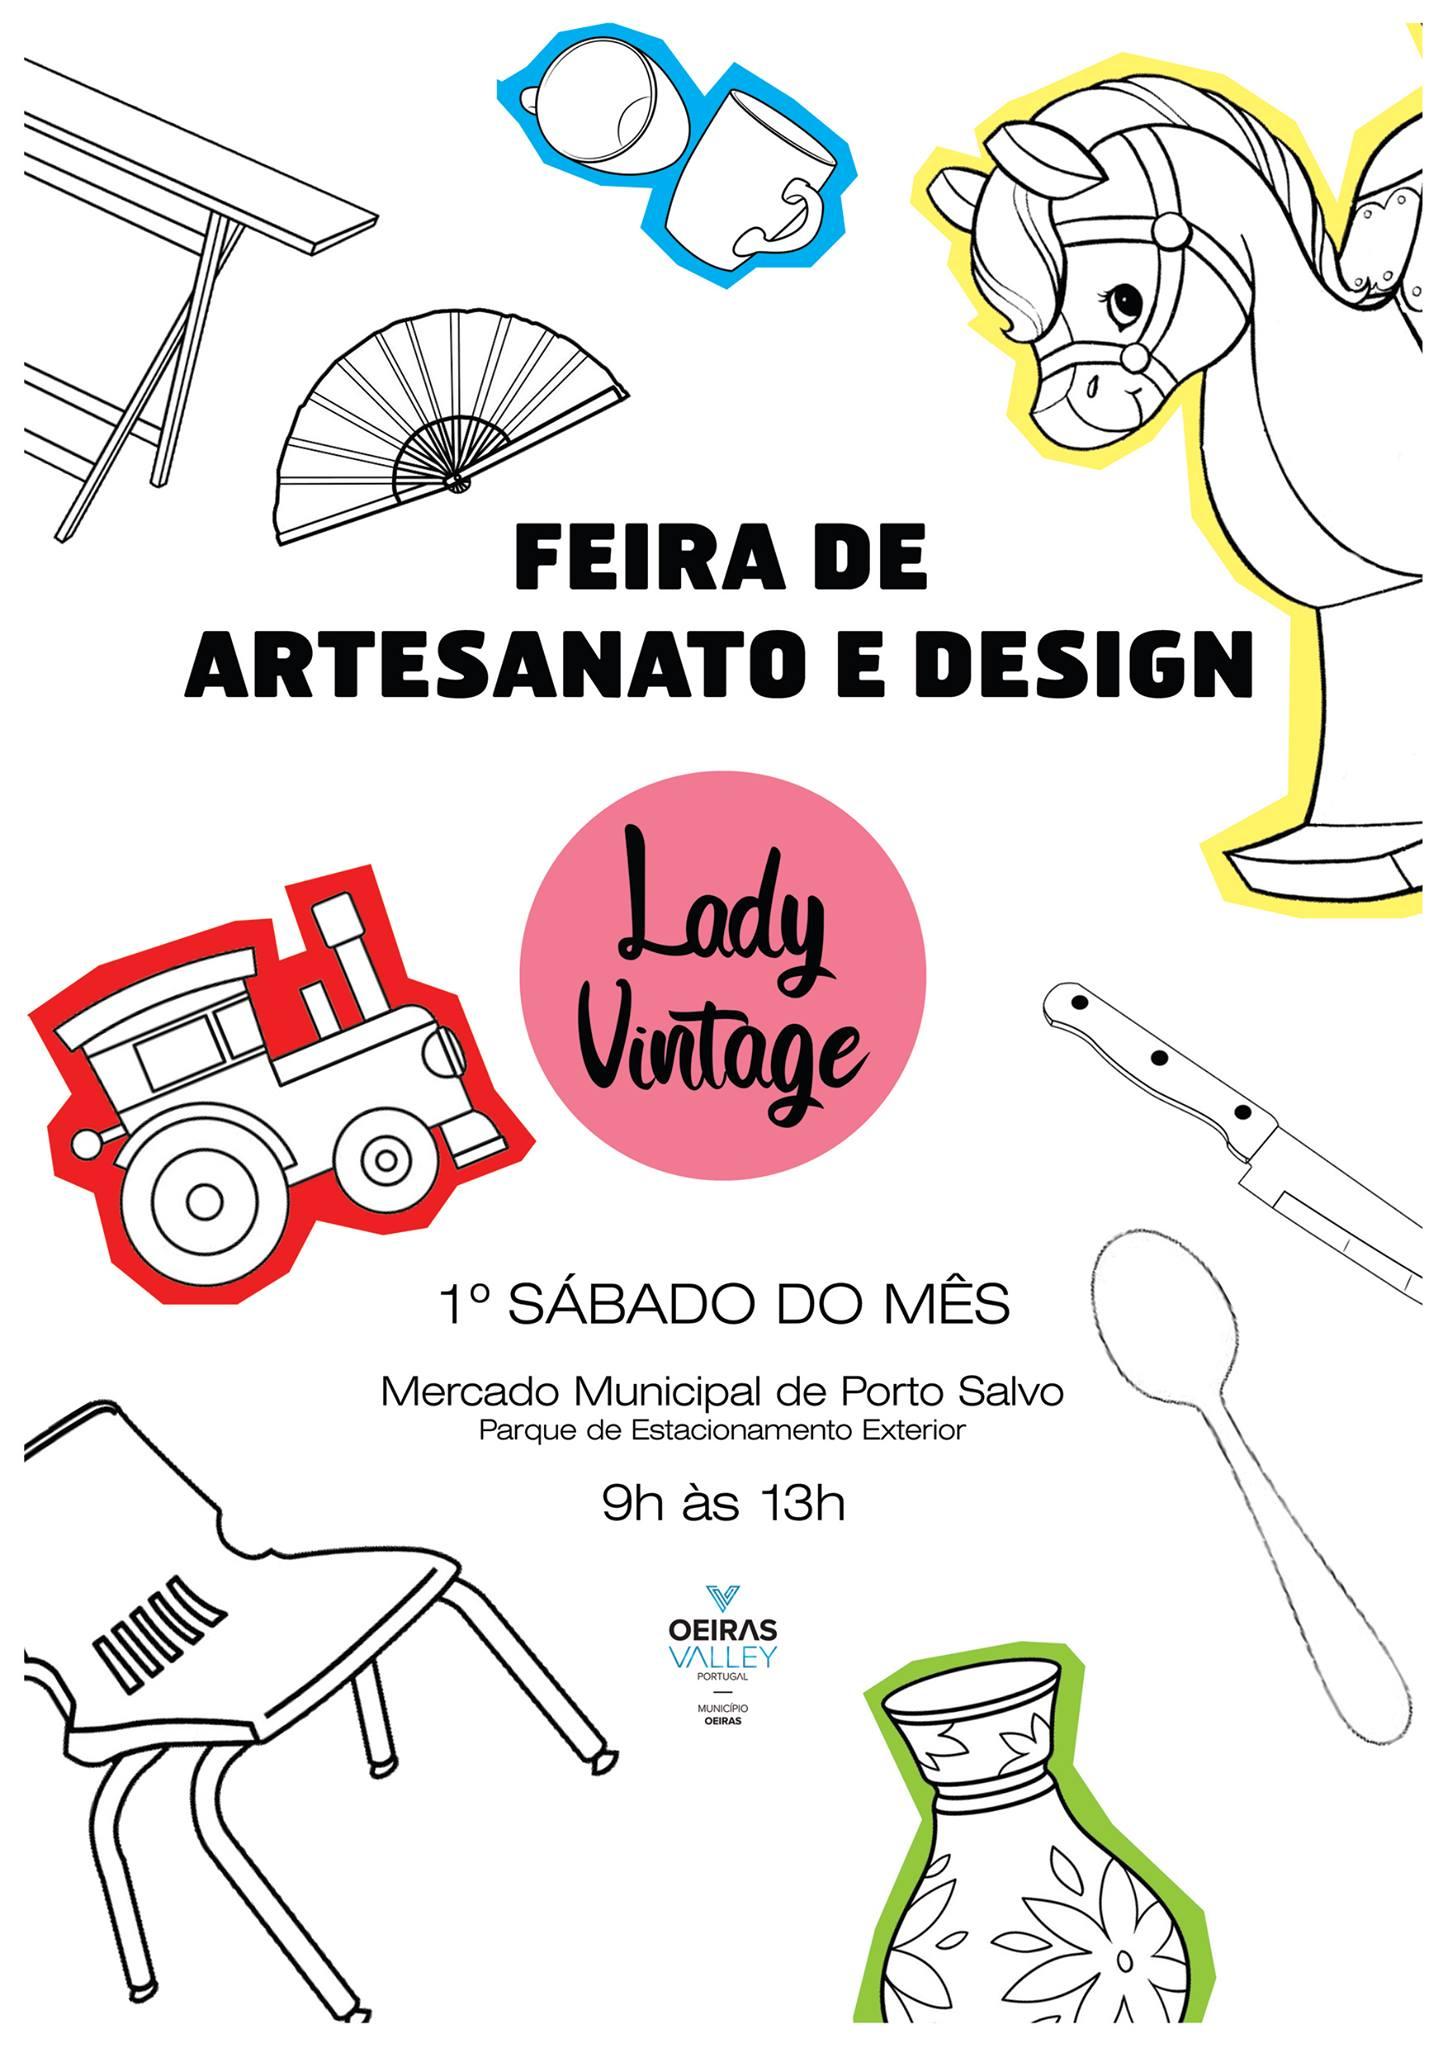 Feira de Artesanato & Design Lady Vintage